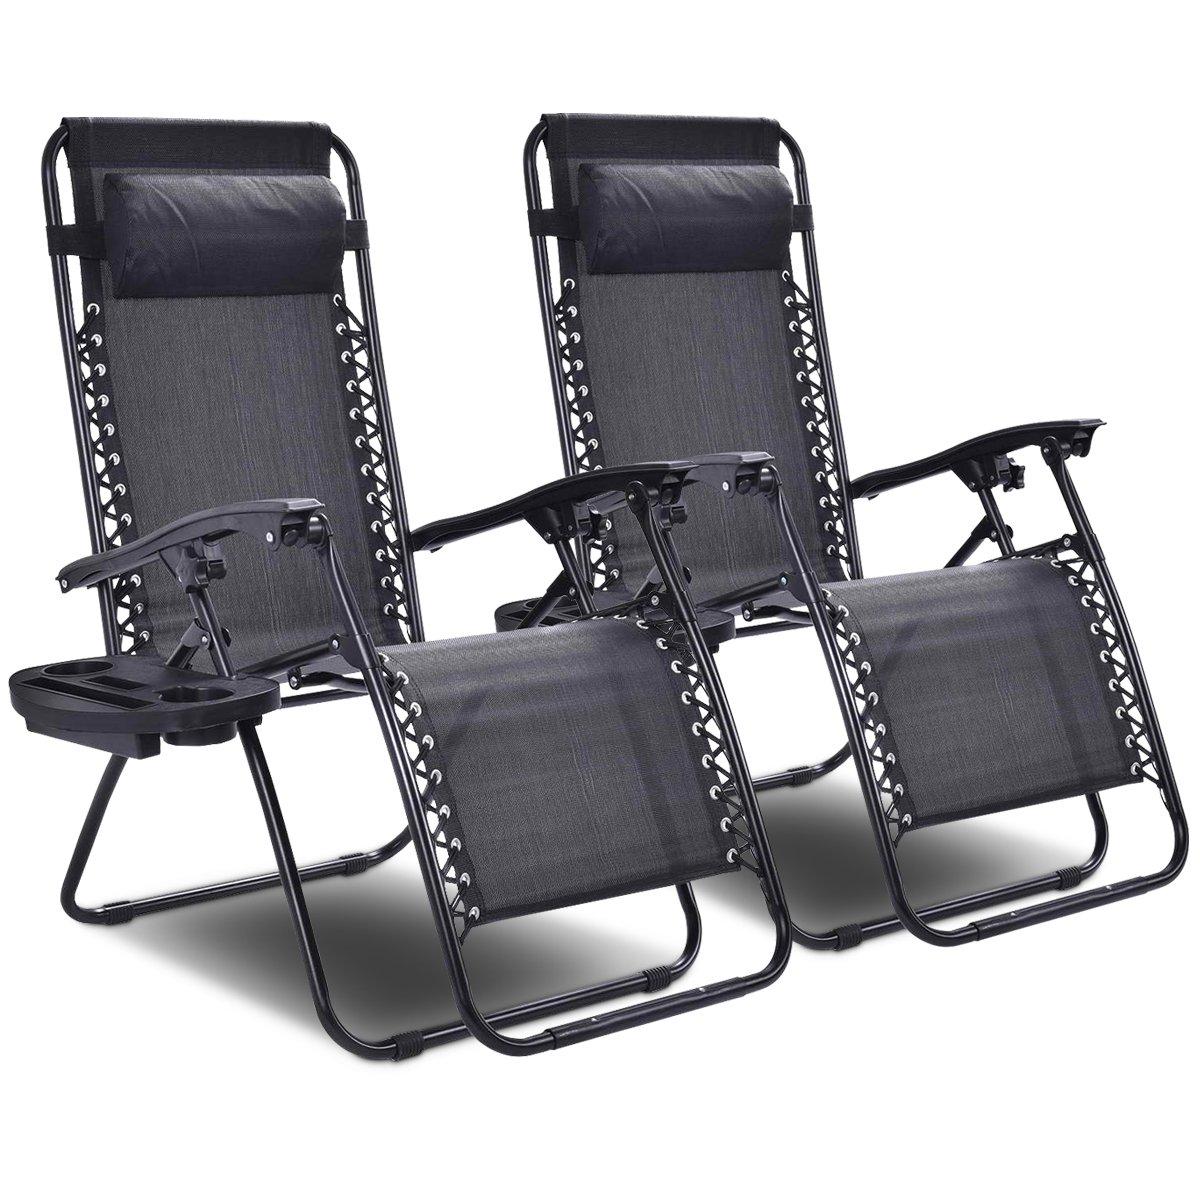 Goplus 2-Pack Zero Gravity Chairs Lounge Patio Folding Recliner -- $79.19 AC + FSSS